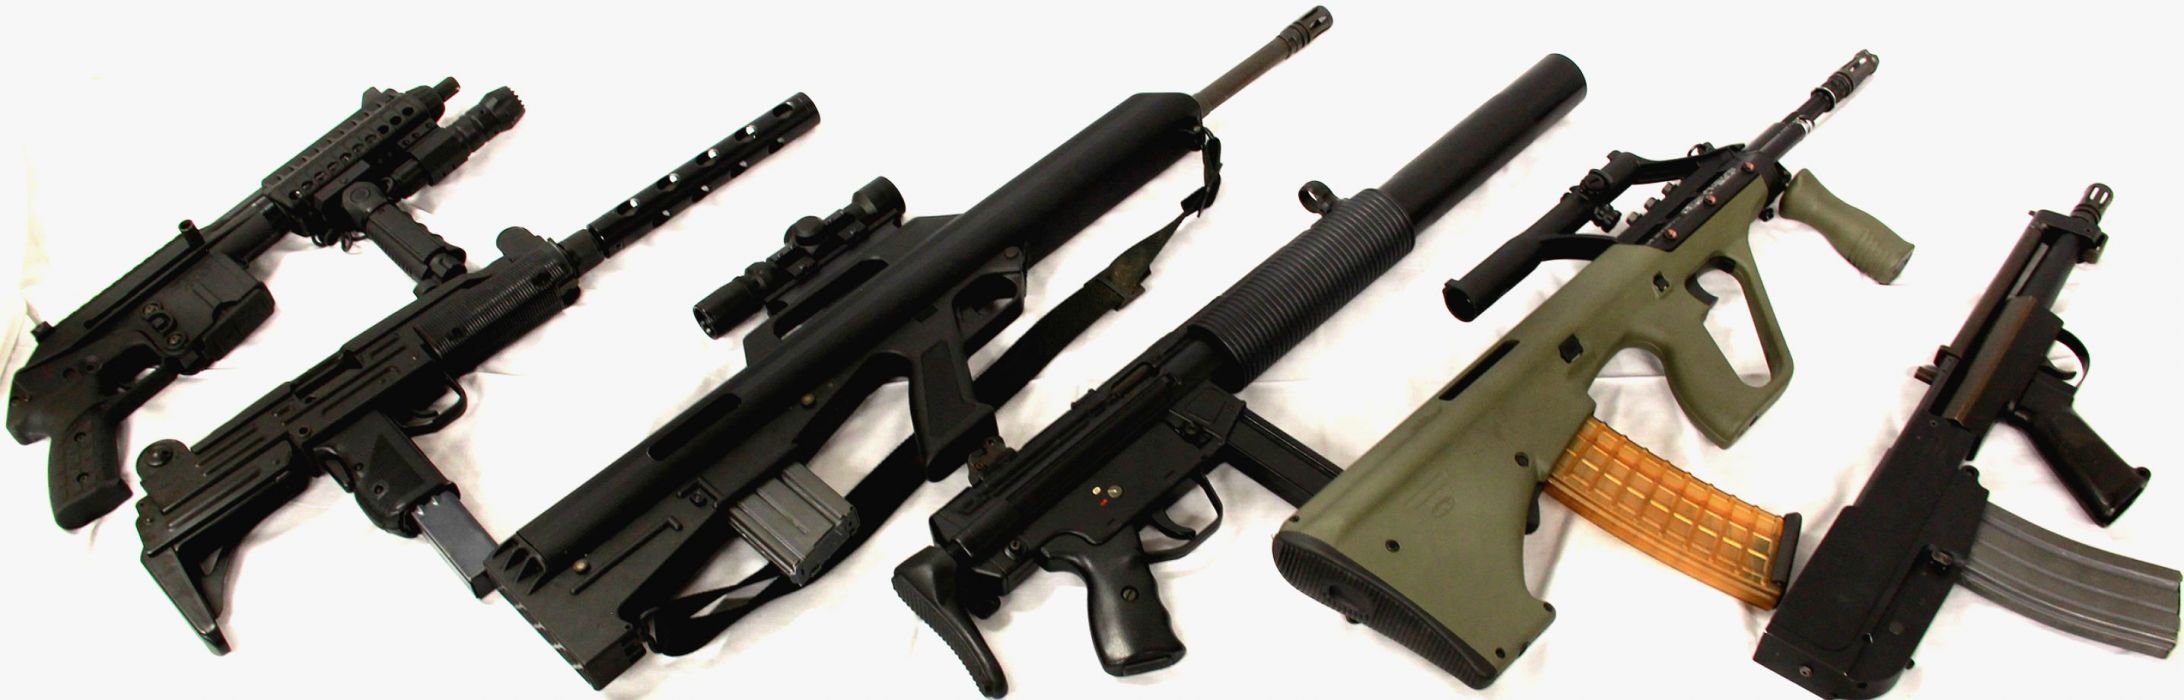 MINI-14 assault rifle weapon gun military mini (25) wallpaper